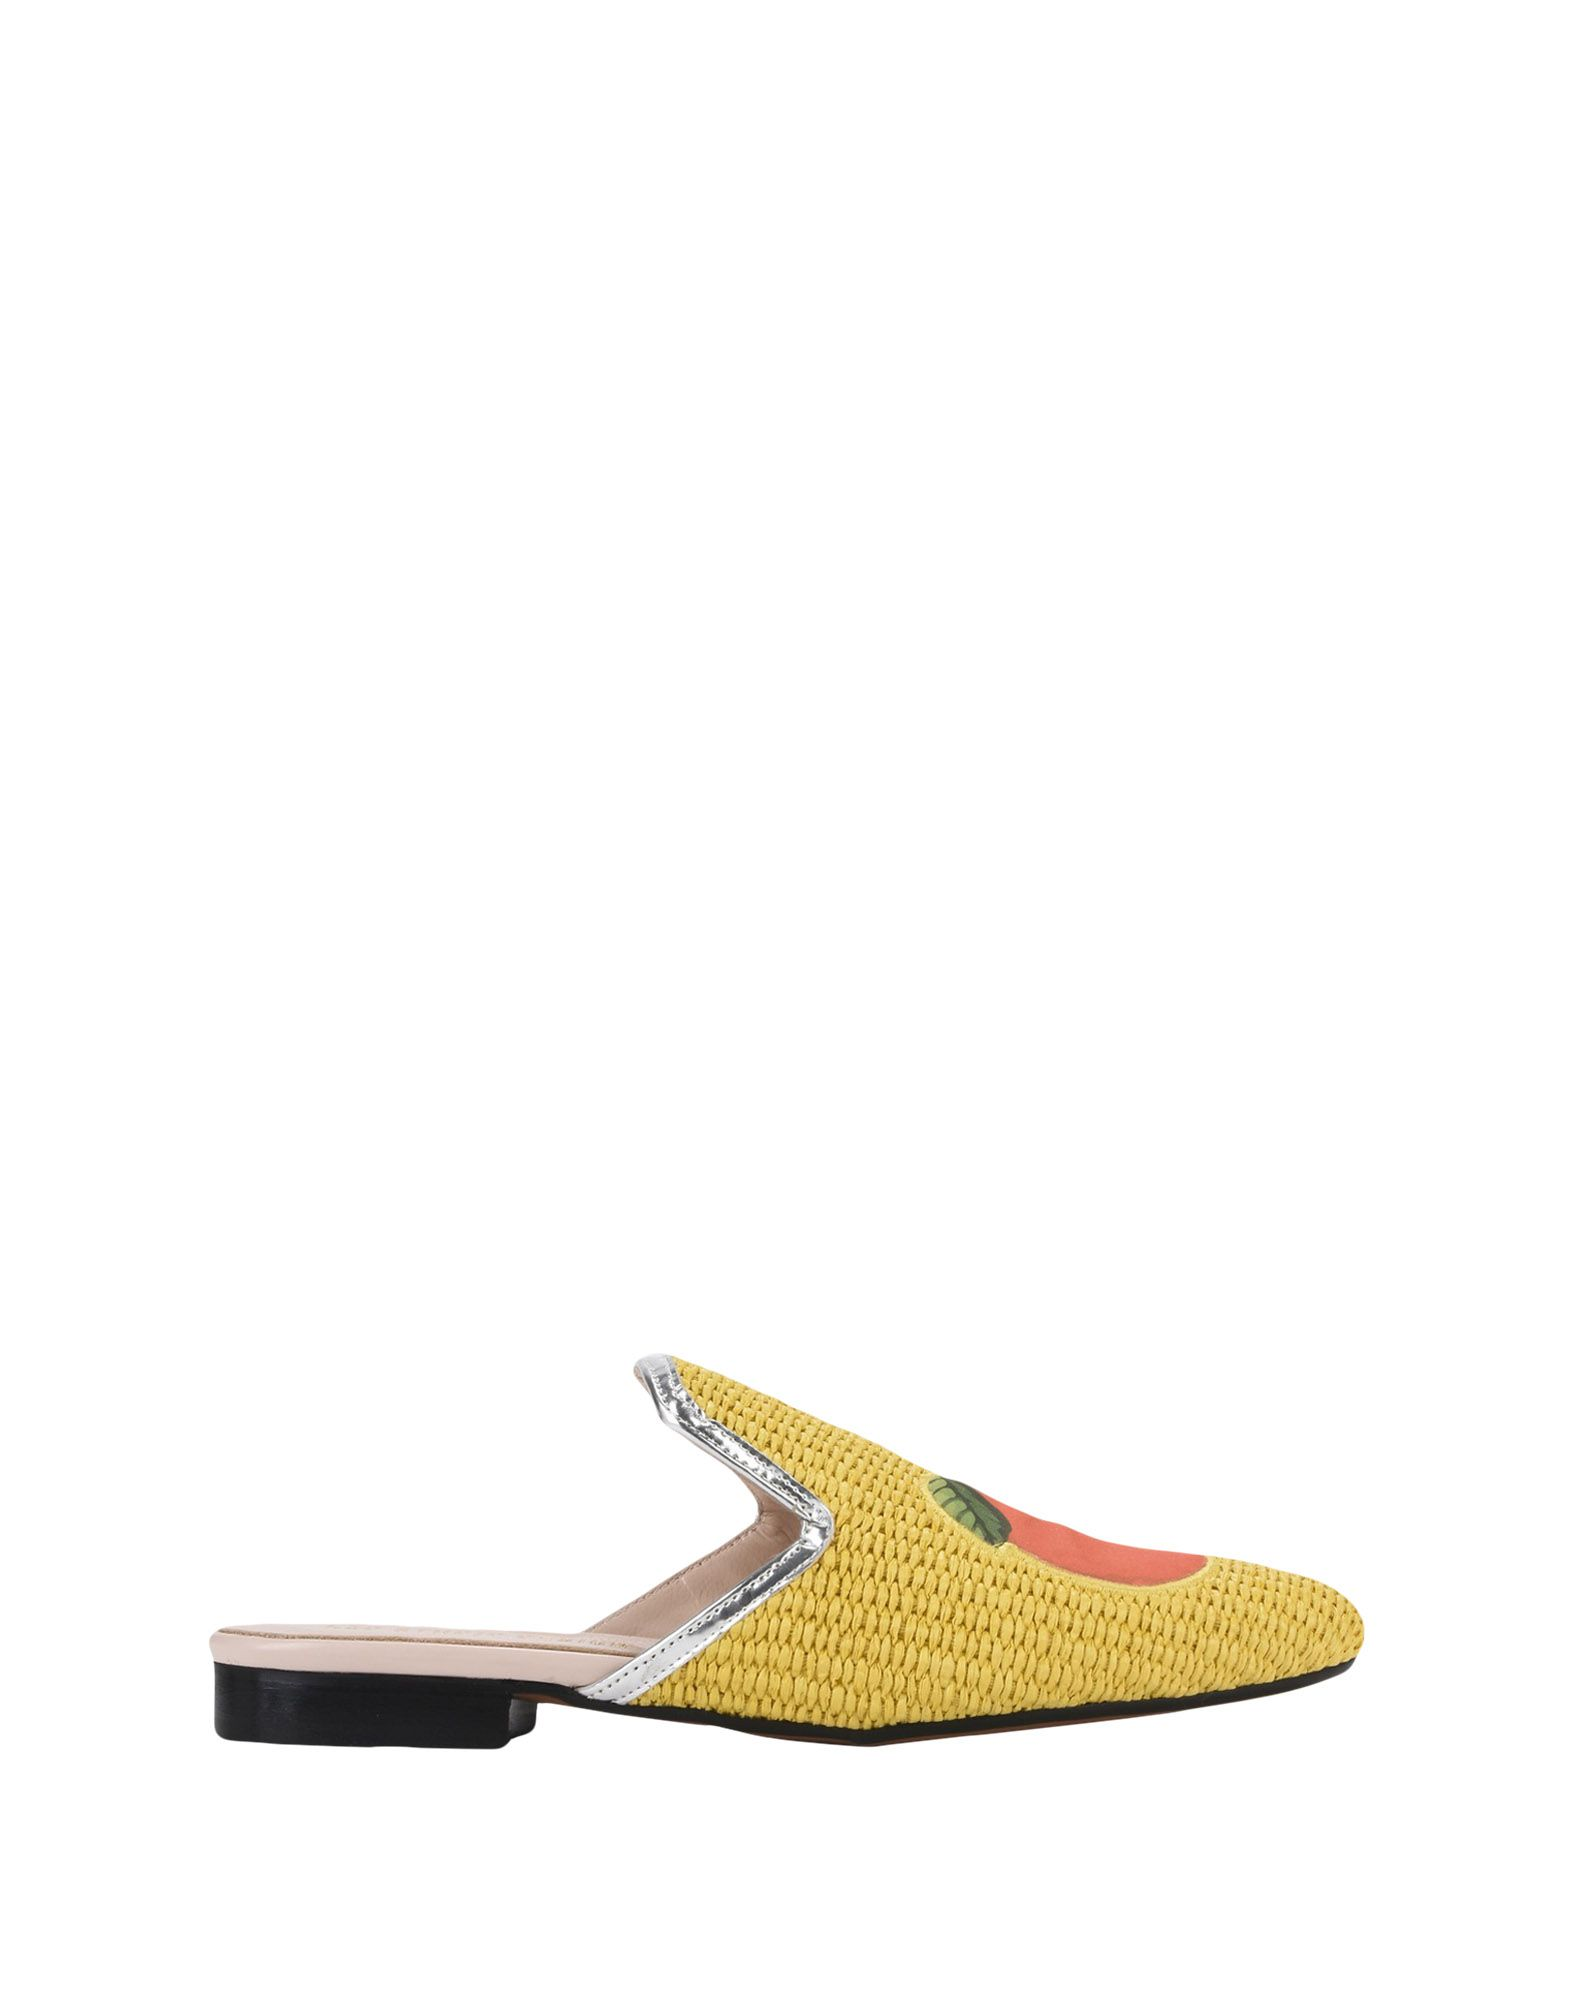 Leo Studio Design Almond beliebte Mule Rafia 11442663DQ Gute Qualität beliebte Almond Schuhe f2a419